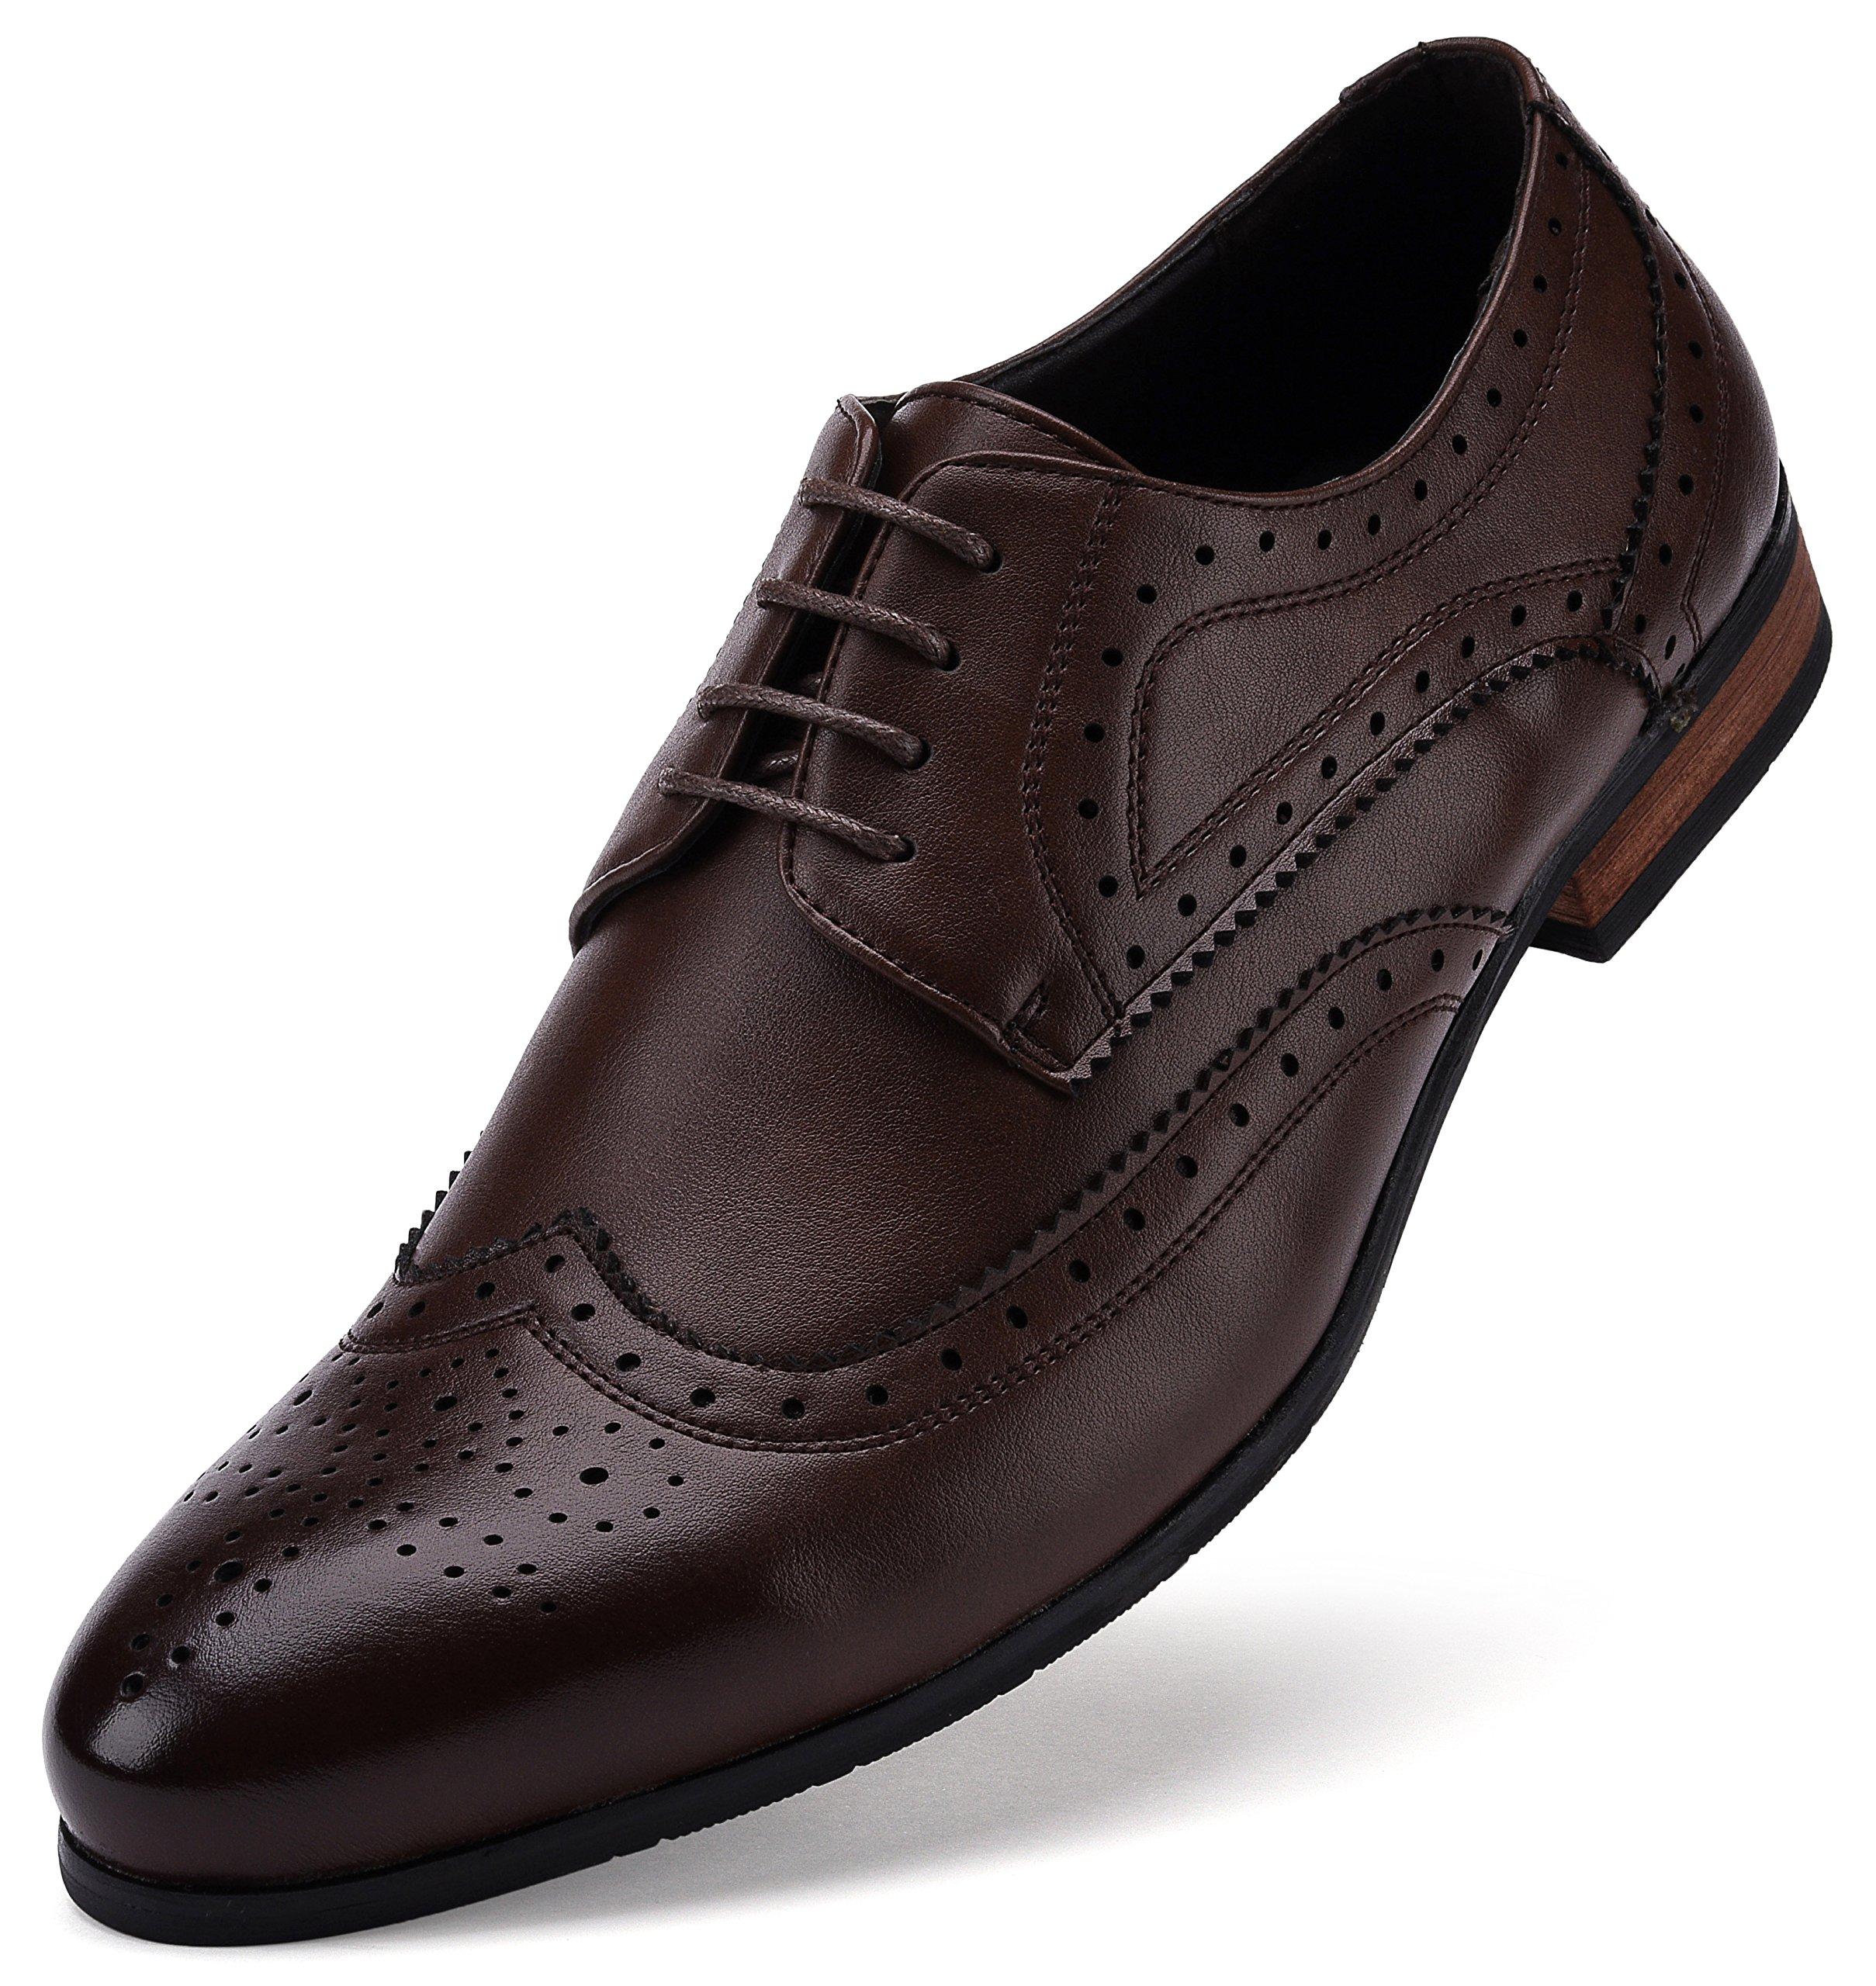 Fine Detail Wingtip Oxford Shoe Chocolate Brown US-8.5D(M)   UK-41-42   EU-8